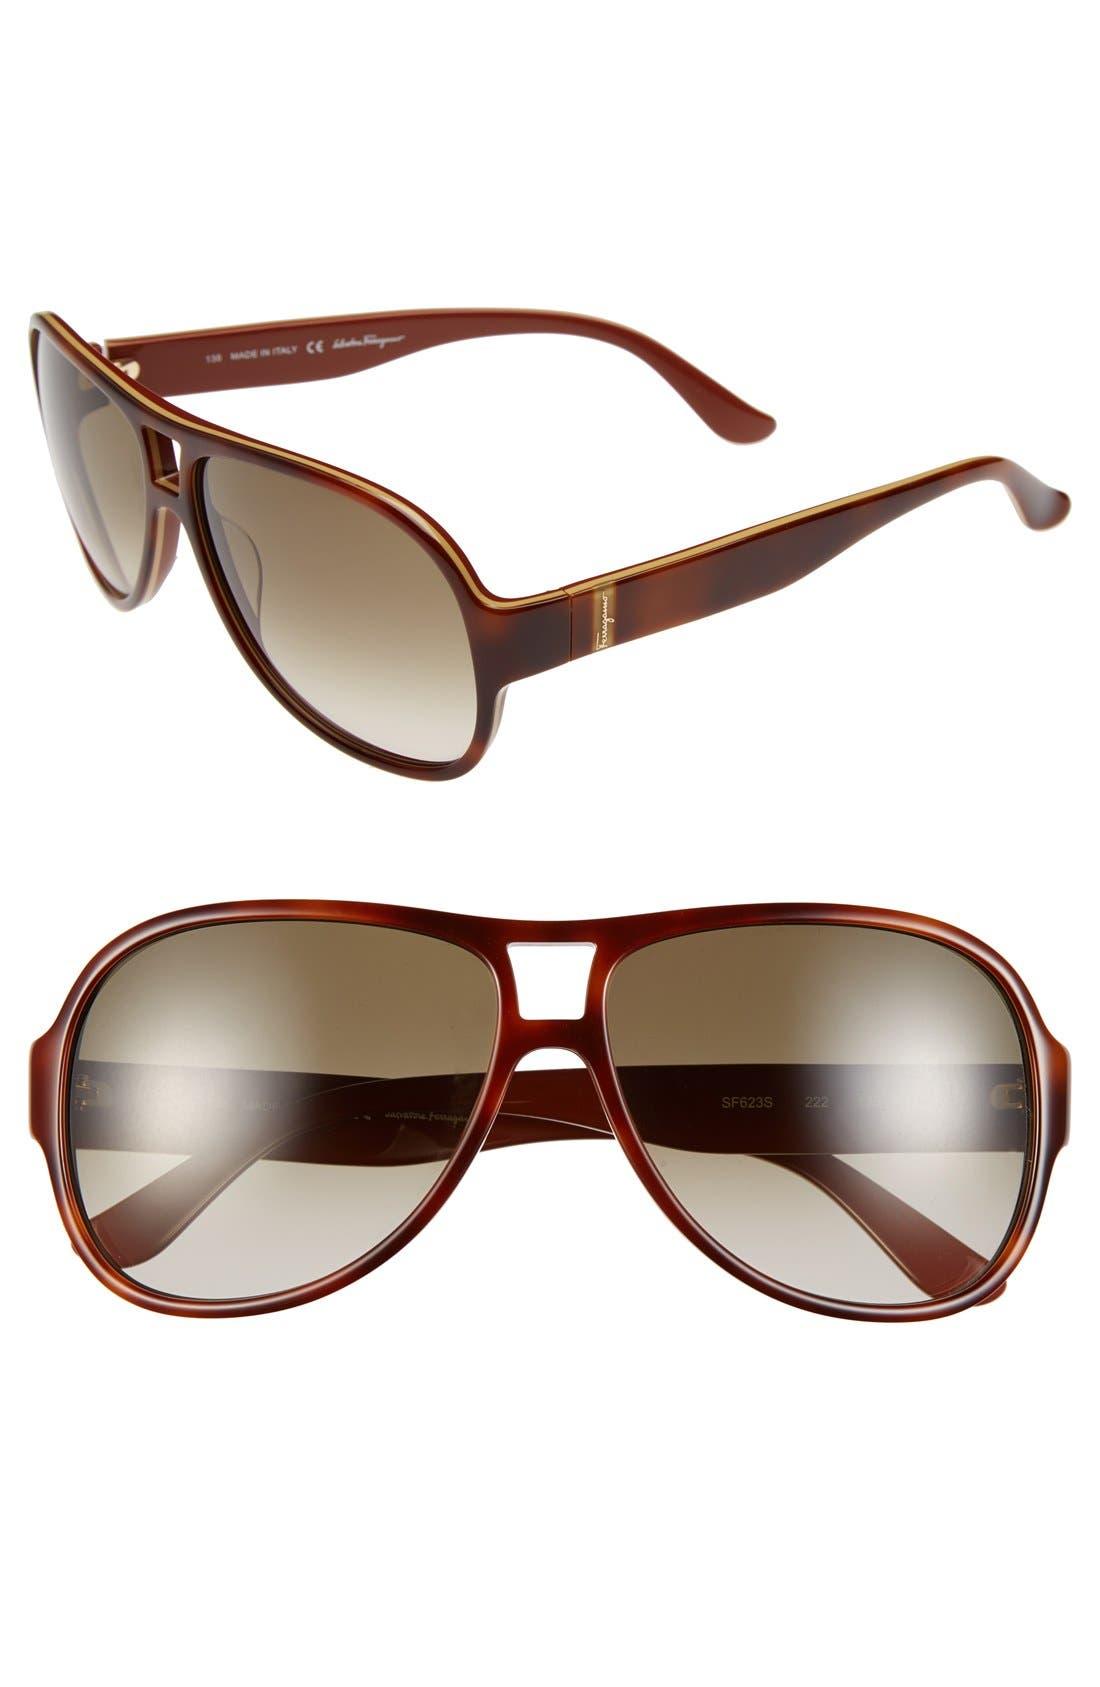 Main Image - Salvatore Ferragamo 59mm Aviator Sunglasses